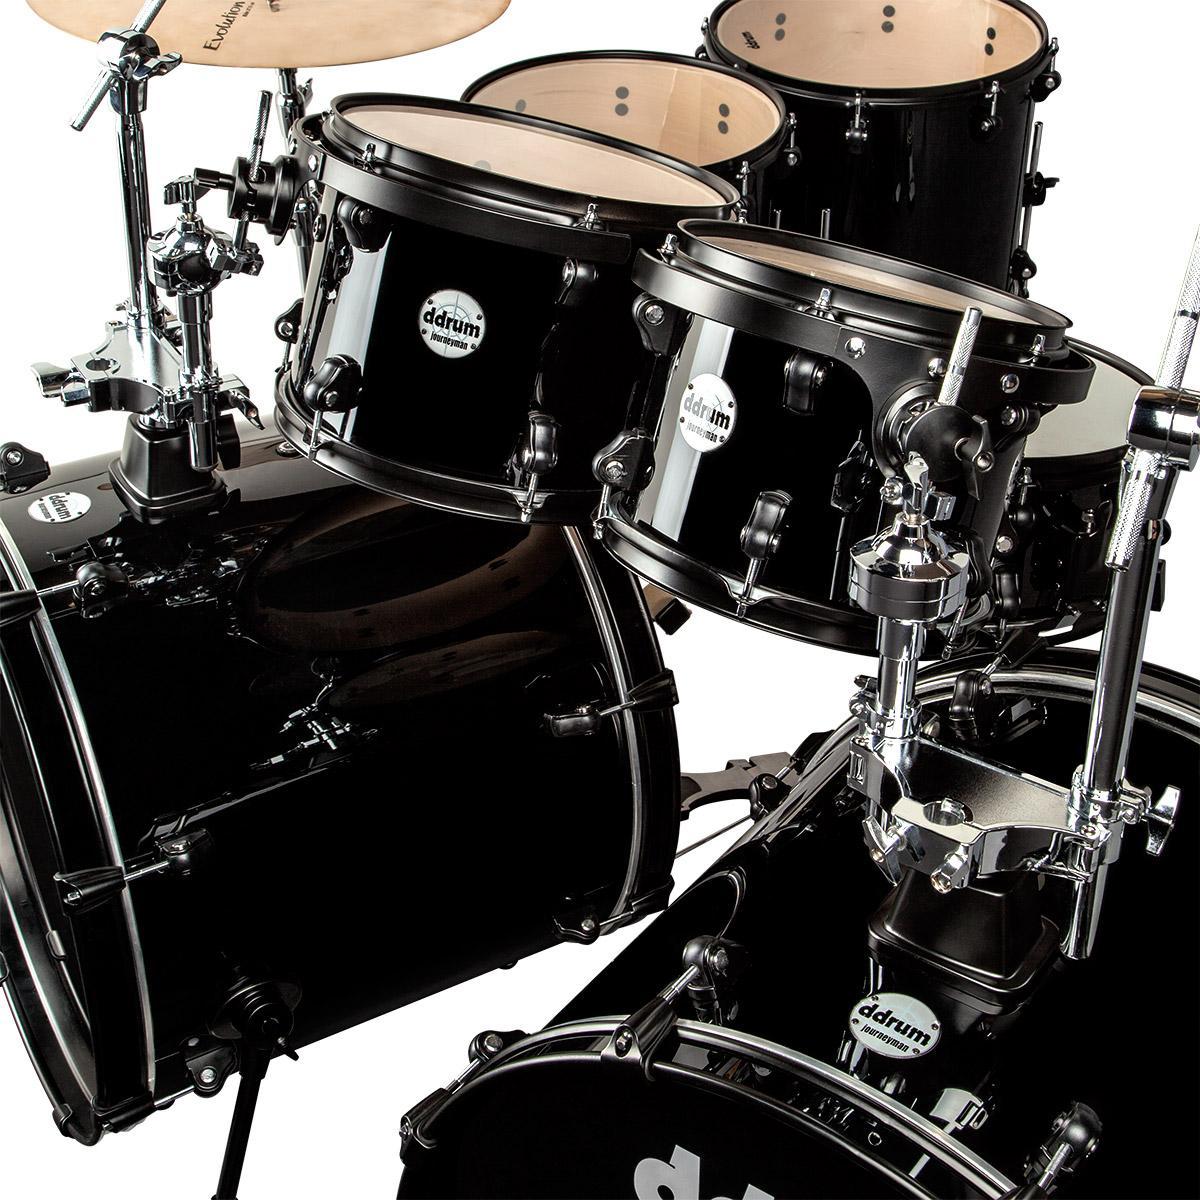 ddrum j2dd722 mb journey double bass 7 piece drum set black musical instruments. Black Bedroom Furniture Sets. Home Design Ideas